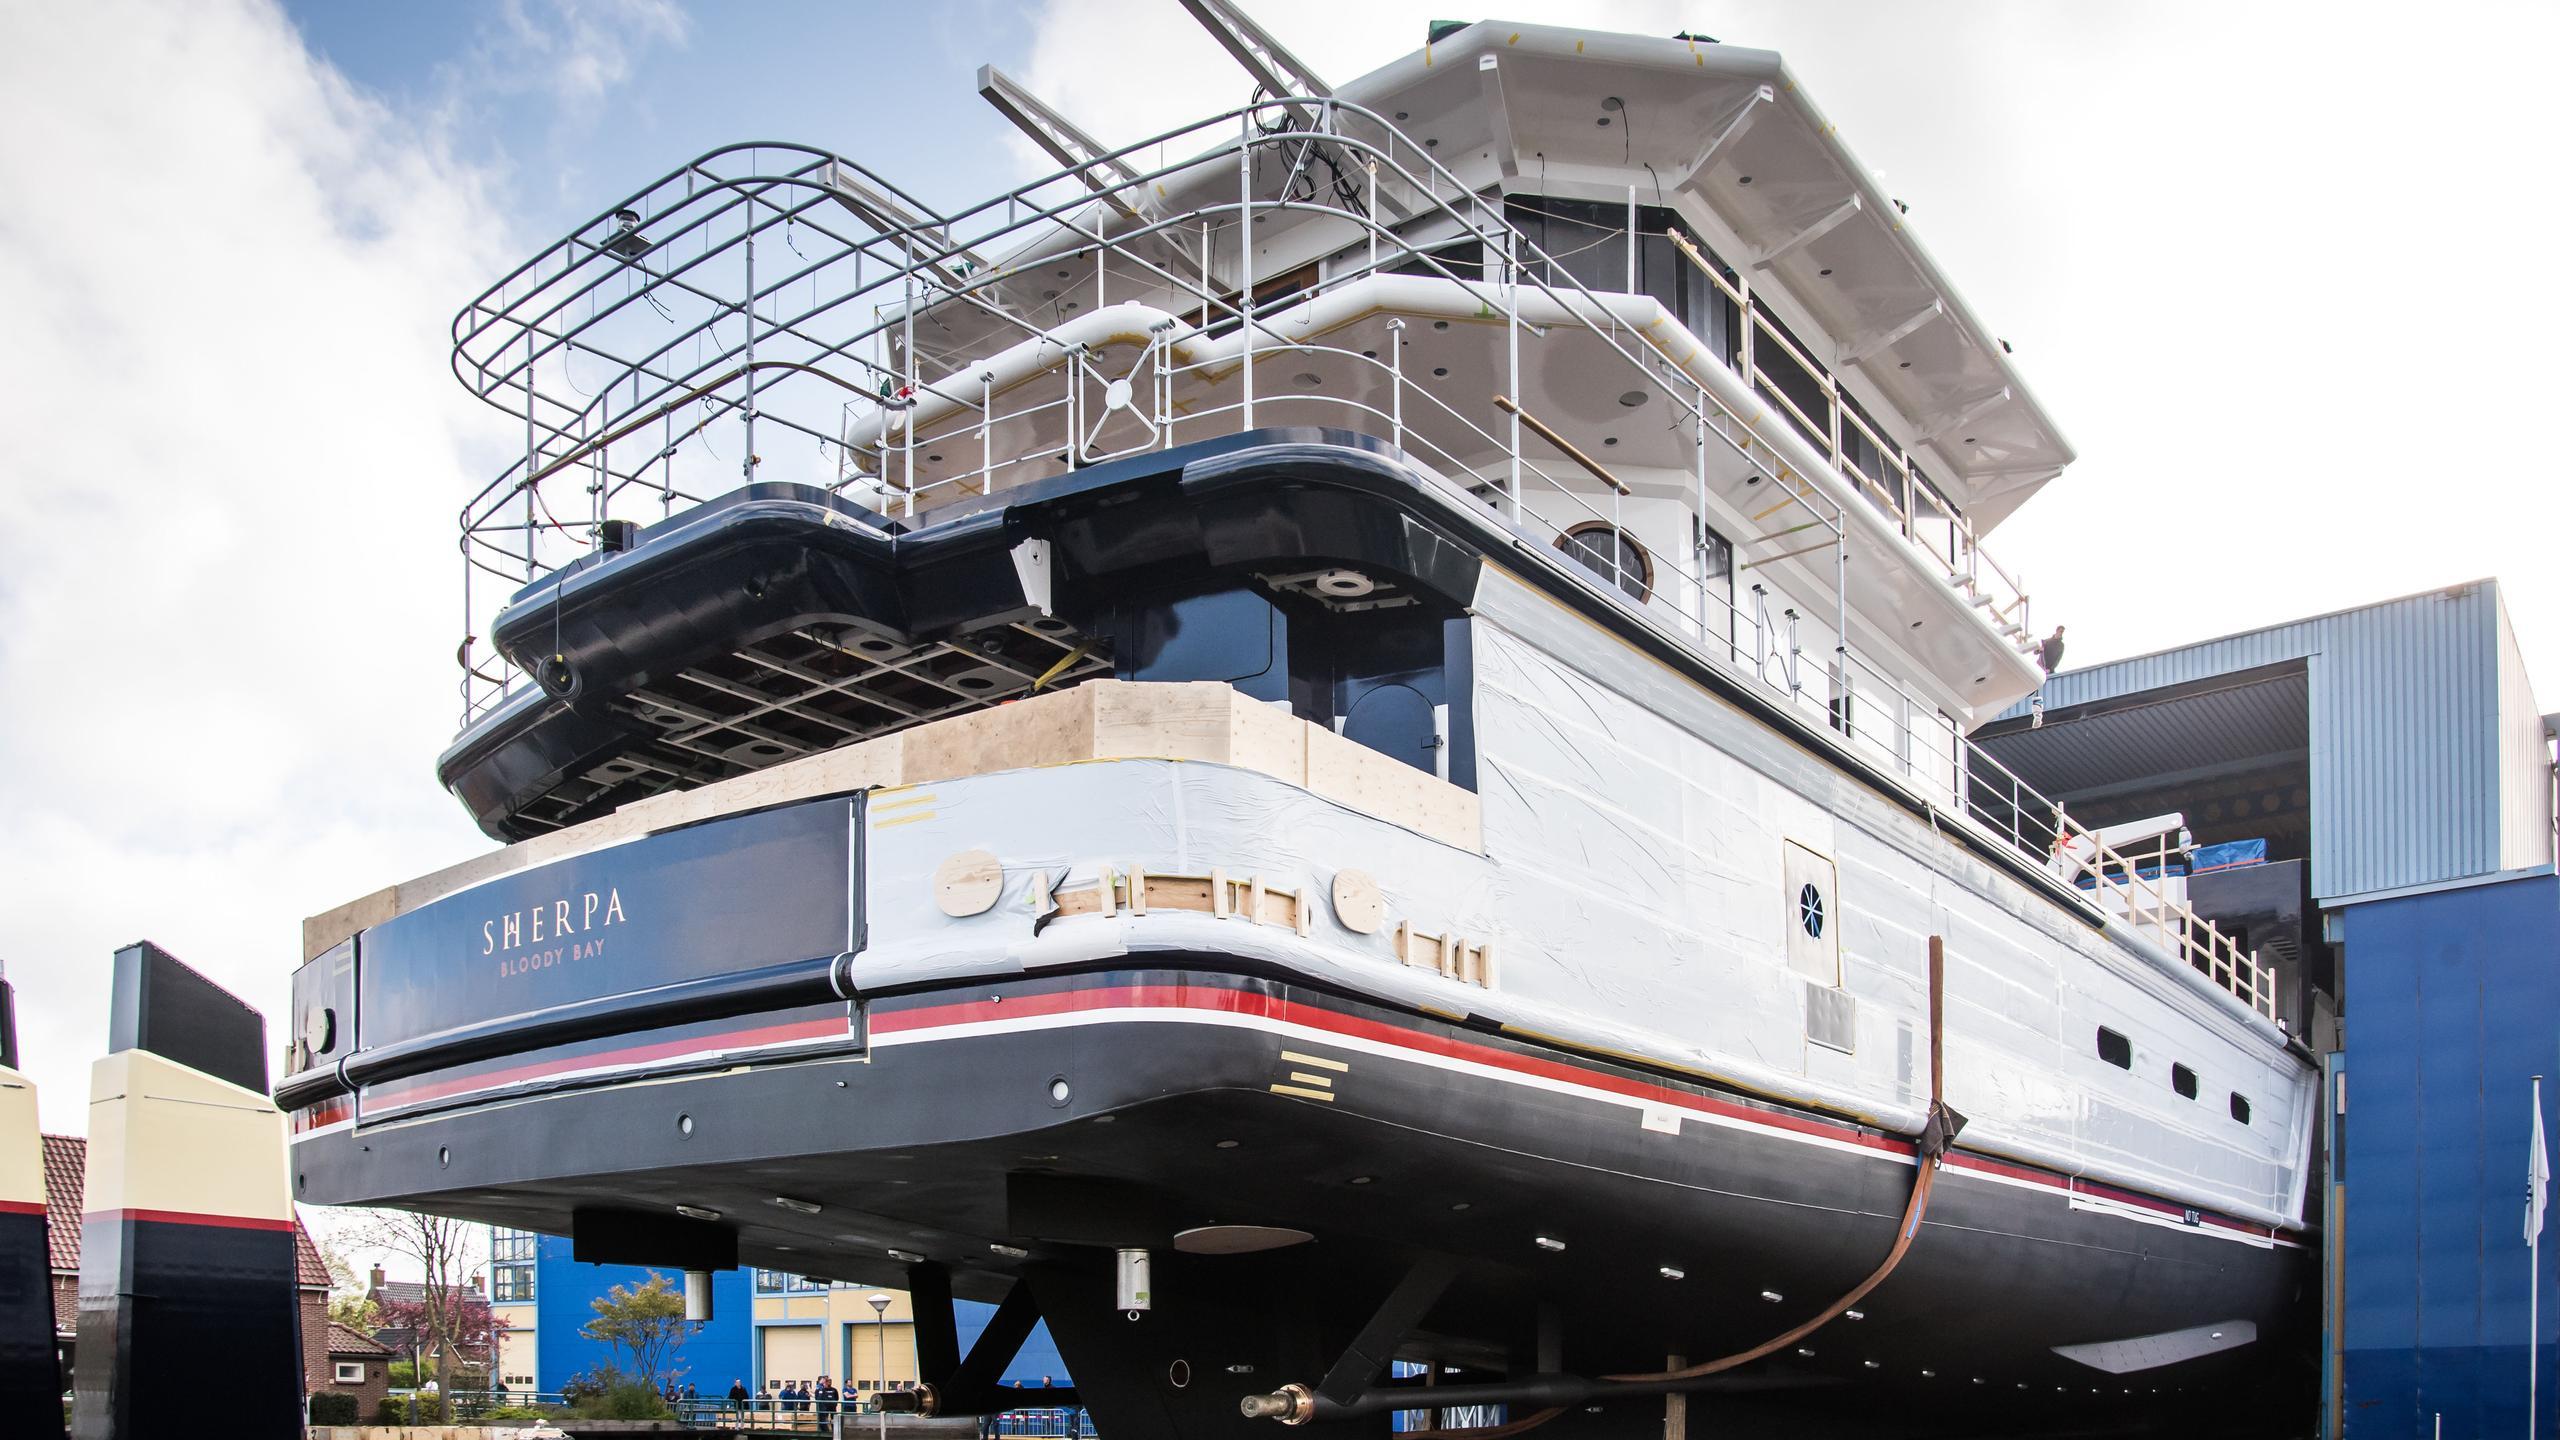 sherpa motoryacht feadship 74m 2018 launch stern